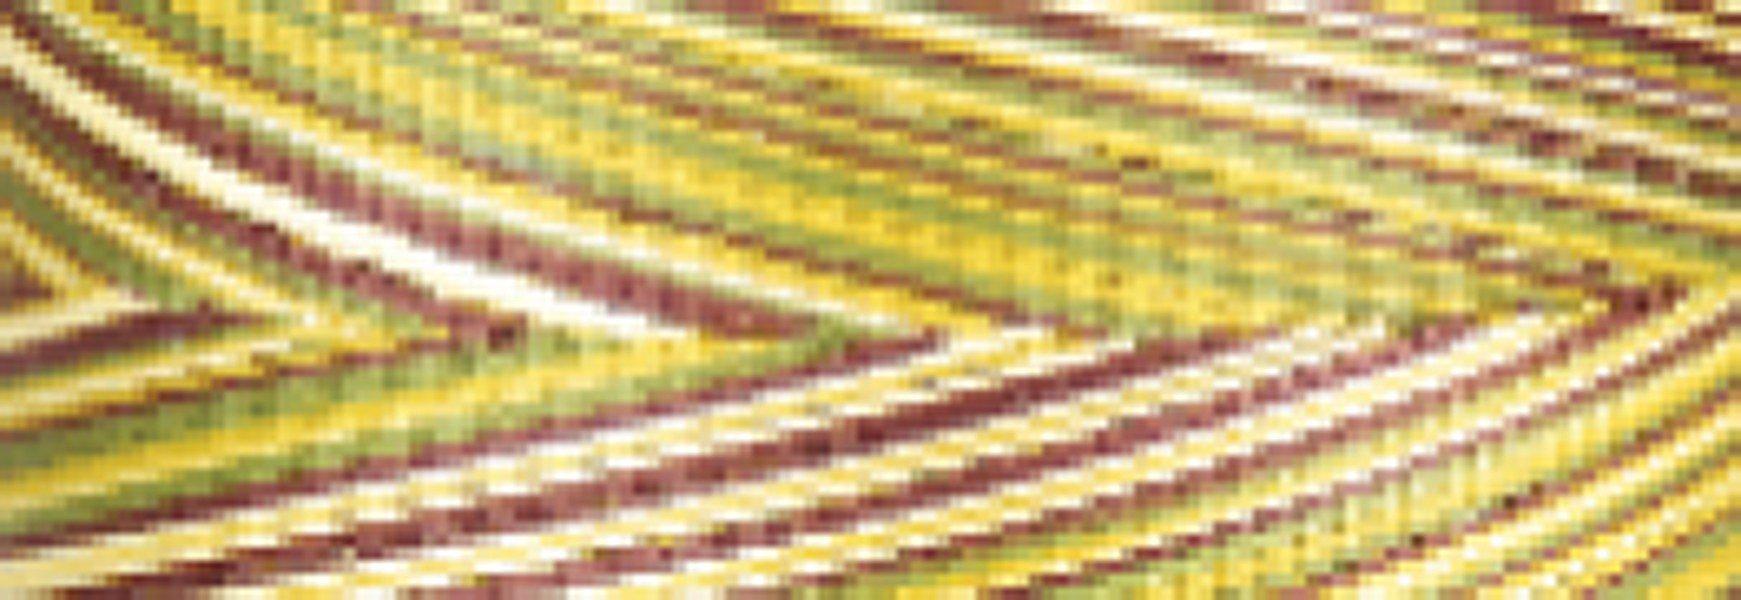 Cotton 40wt Thread 700yd - Variegated Corn Field